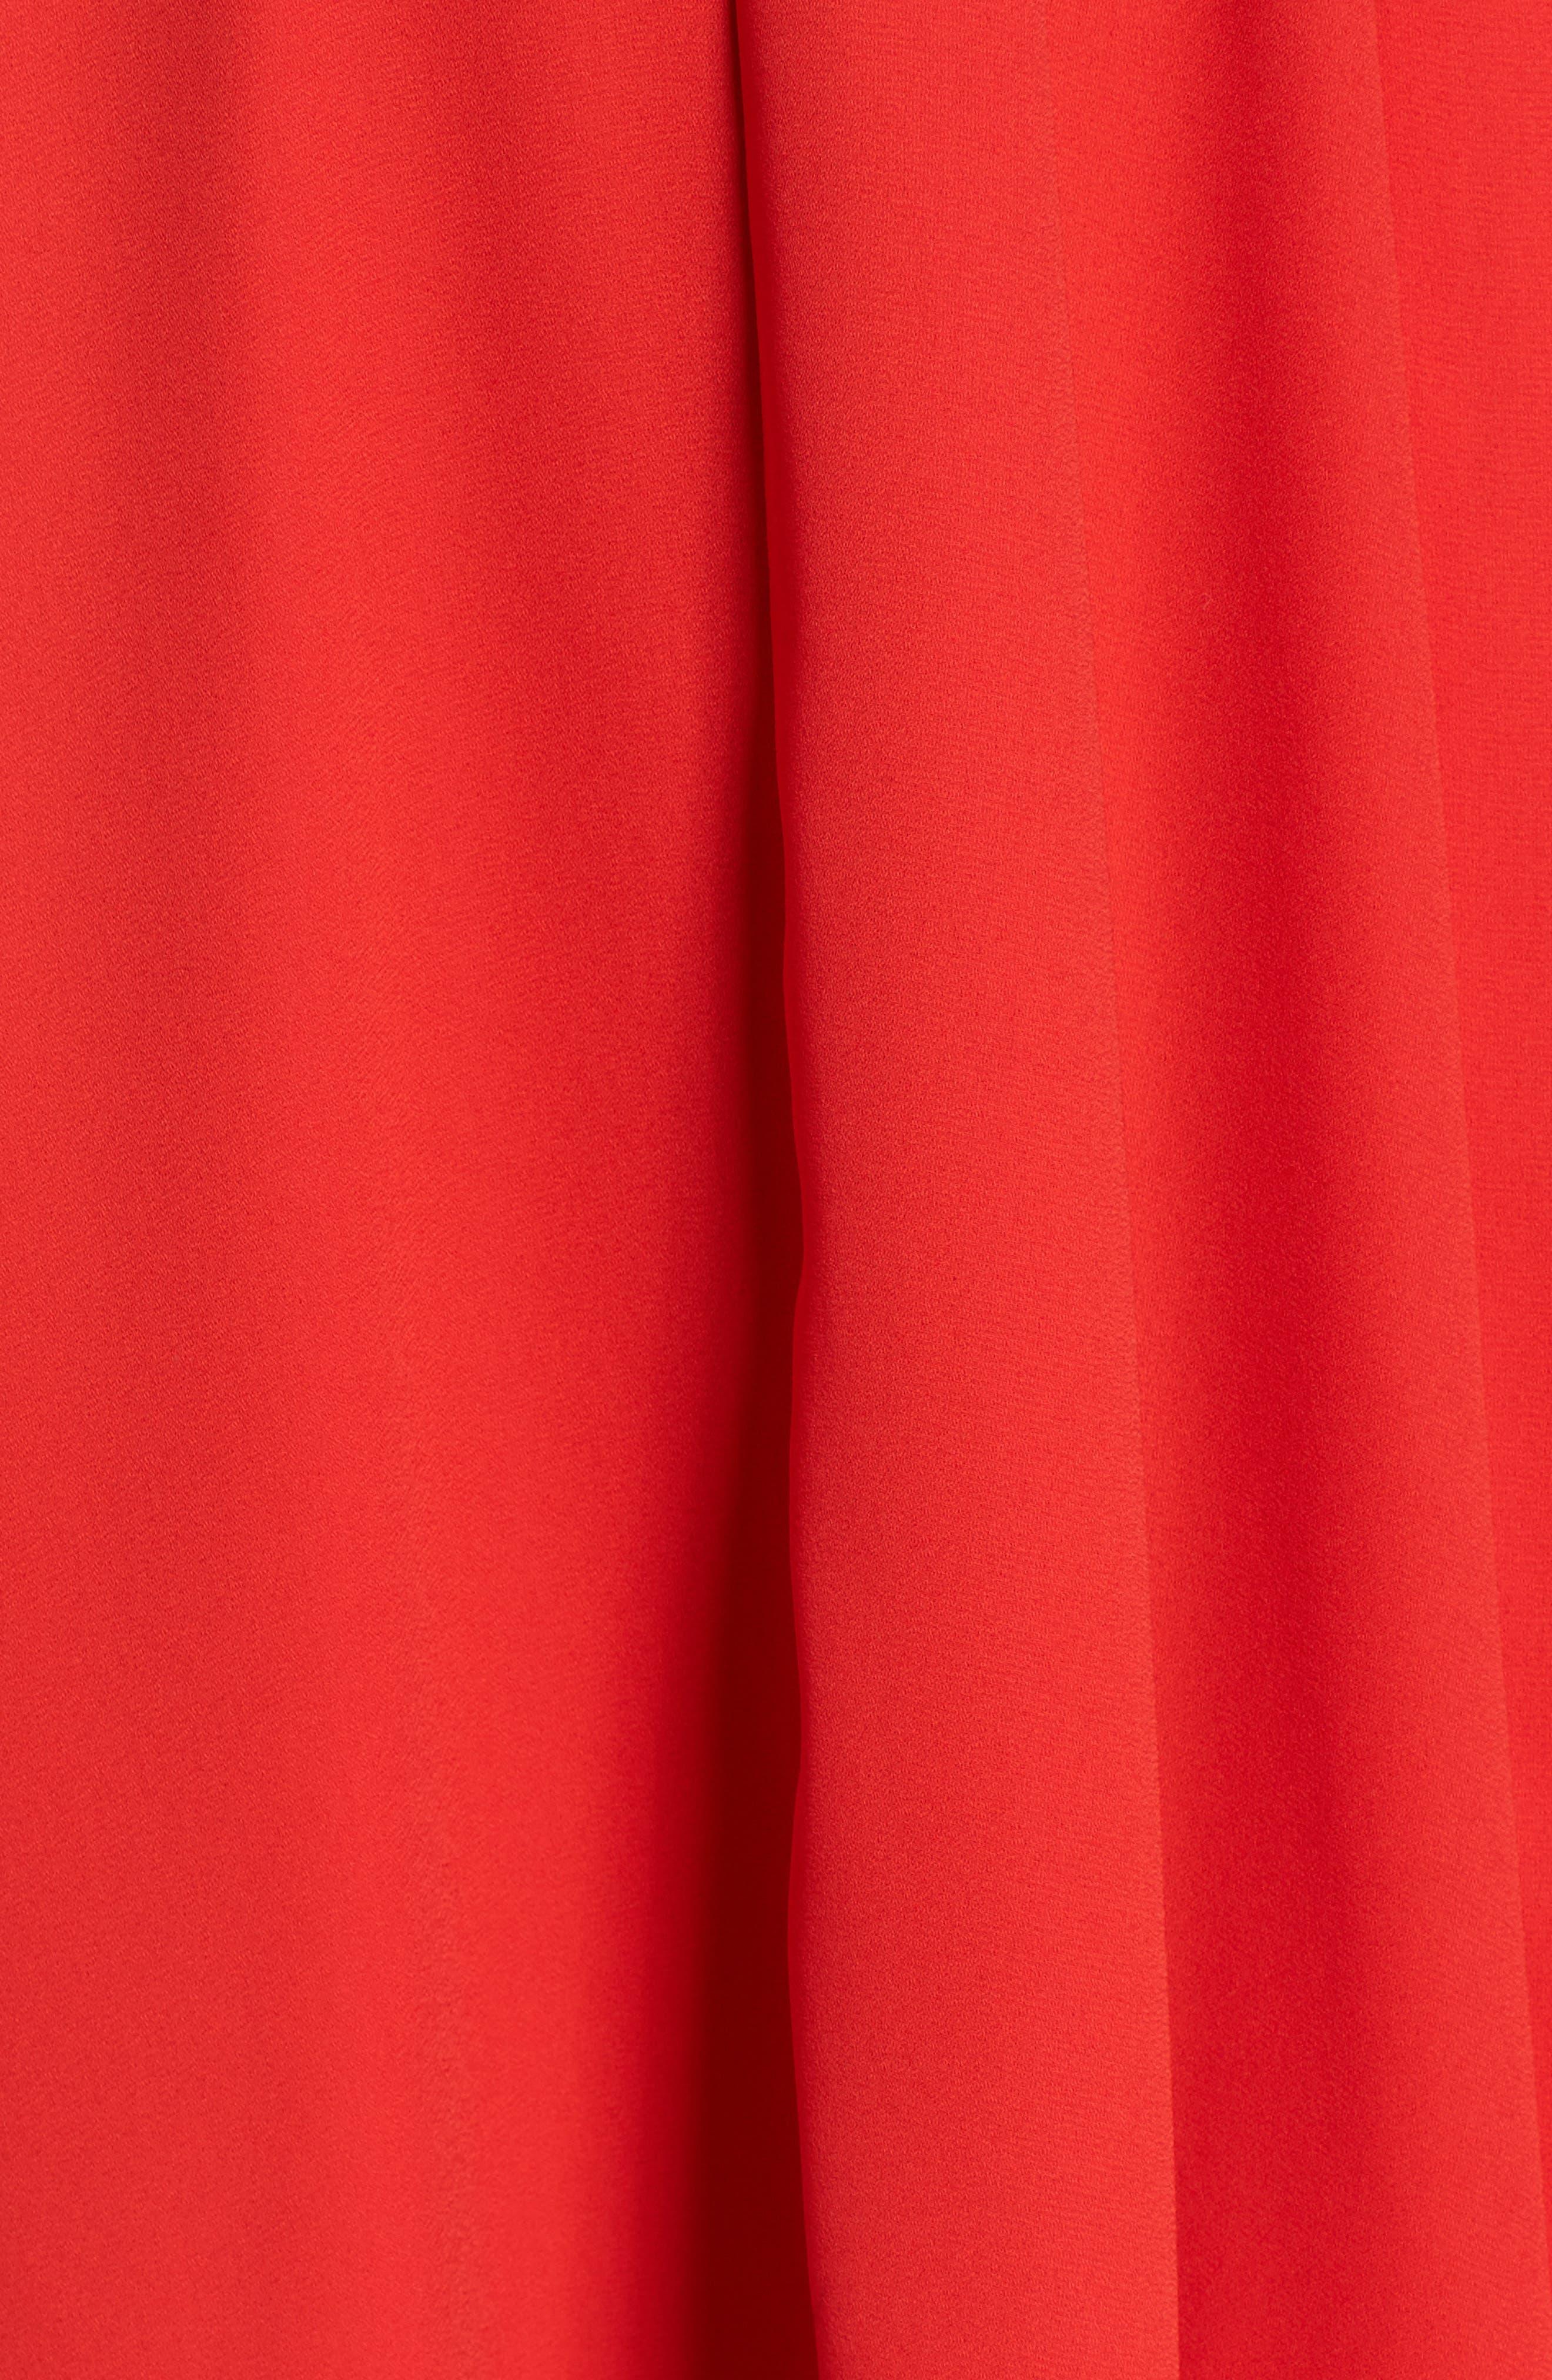 Asymmetrical Ruffle Dress,                             Alternate thumbnail 5, color,                             Red